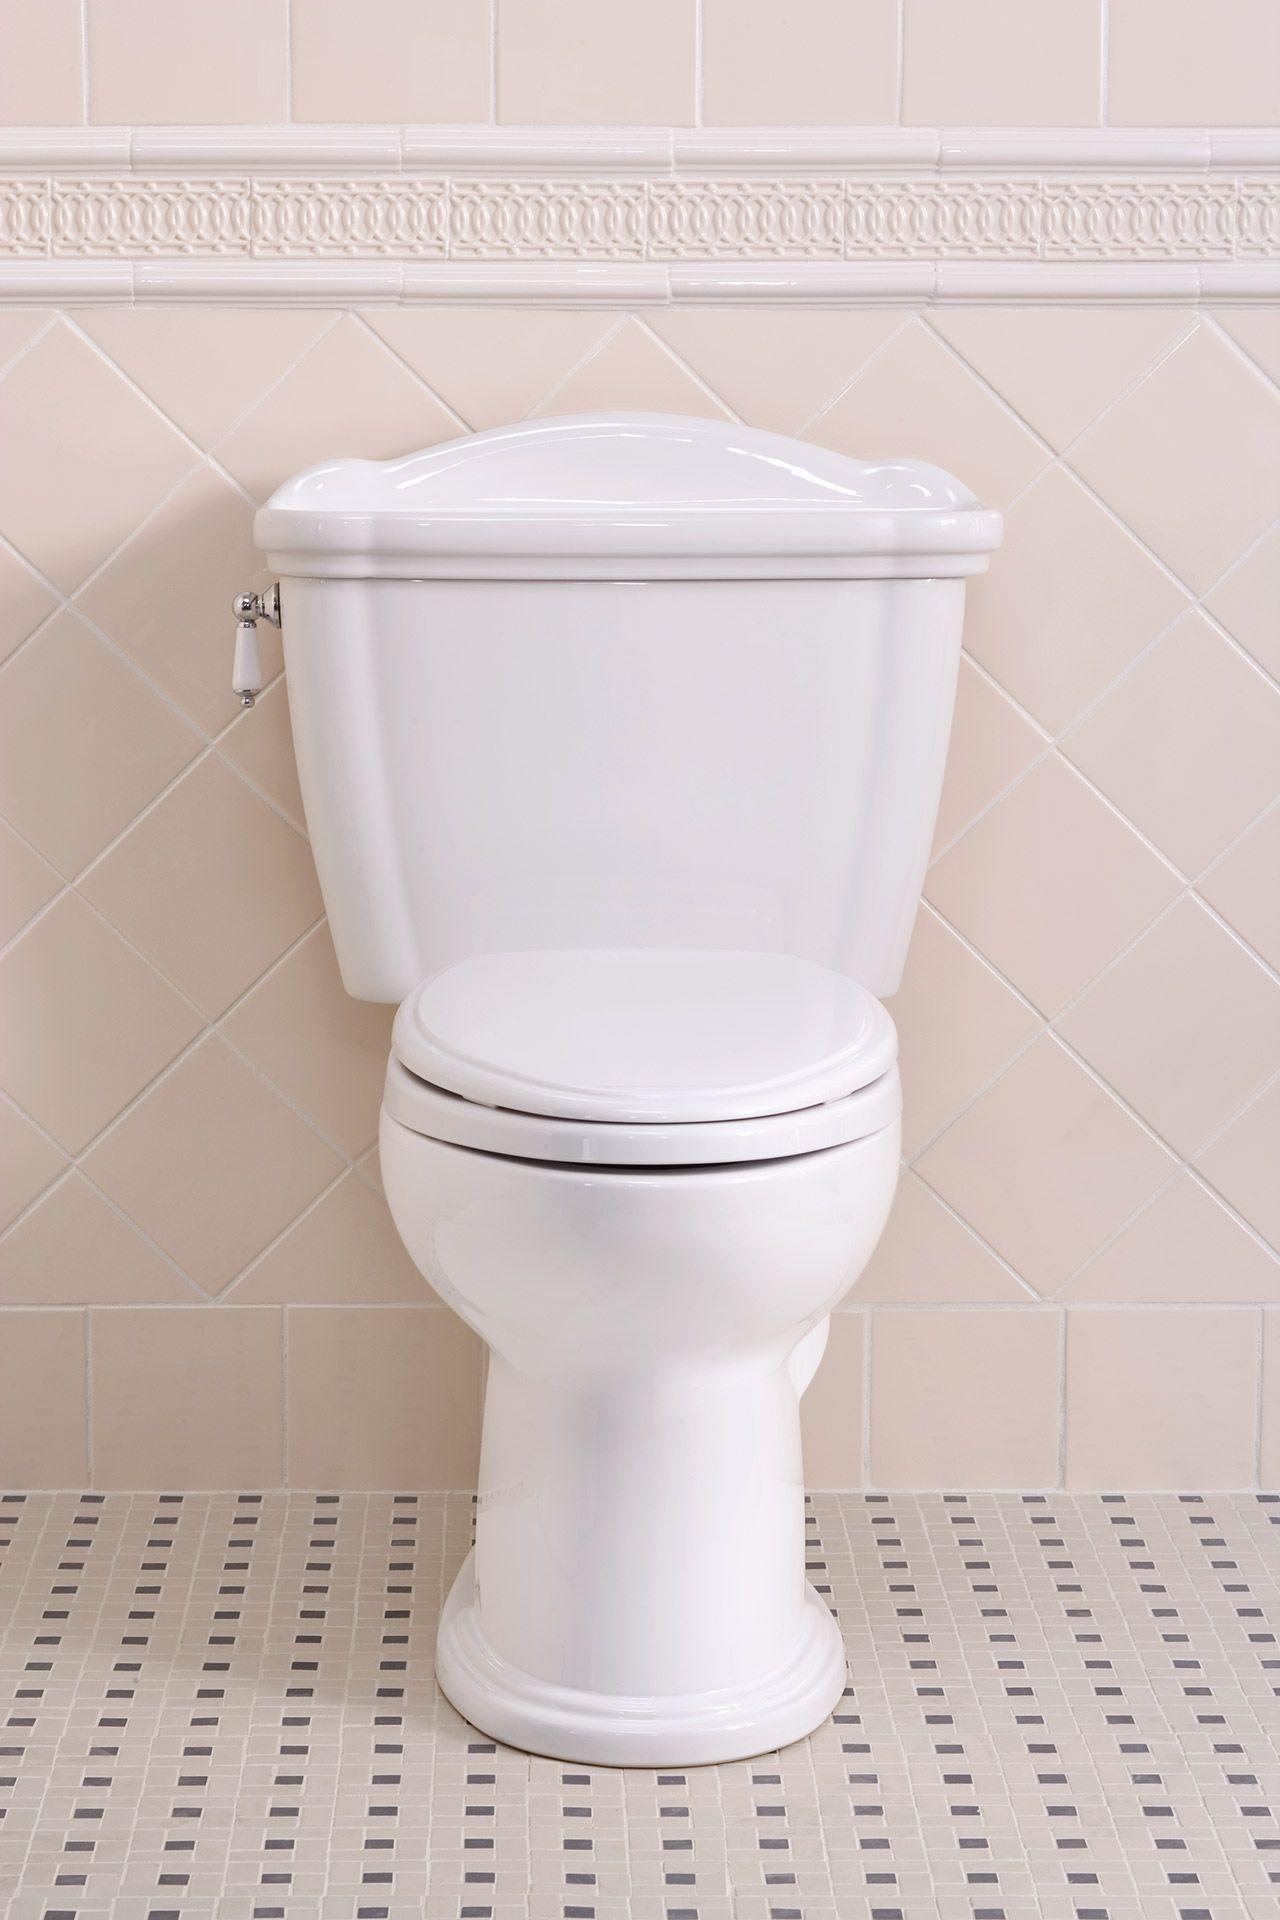 Eco Whitney® Two-Piece Toilet, 1.28 GPF, Elongated Bowl - TotoUSA.com